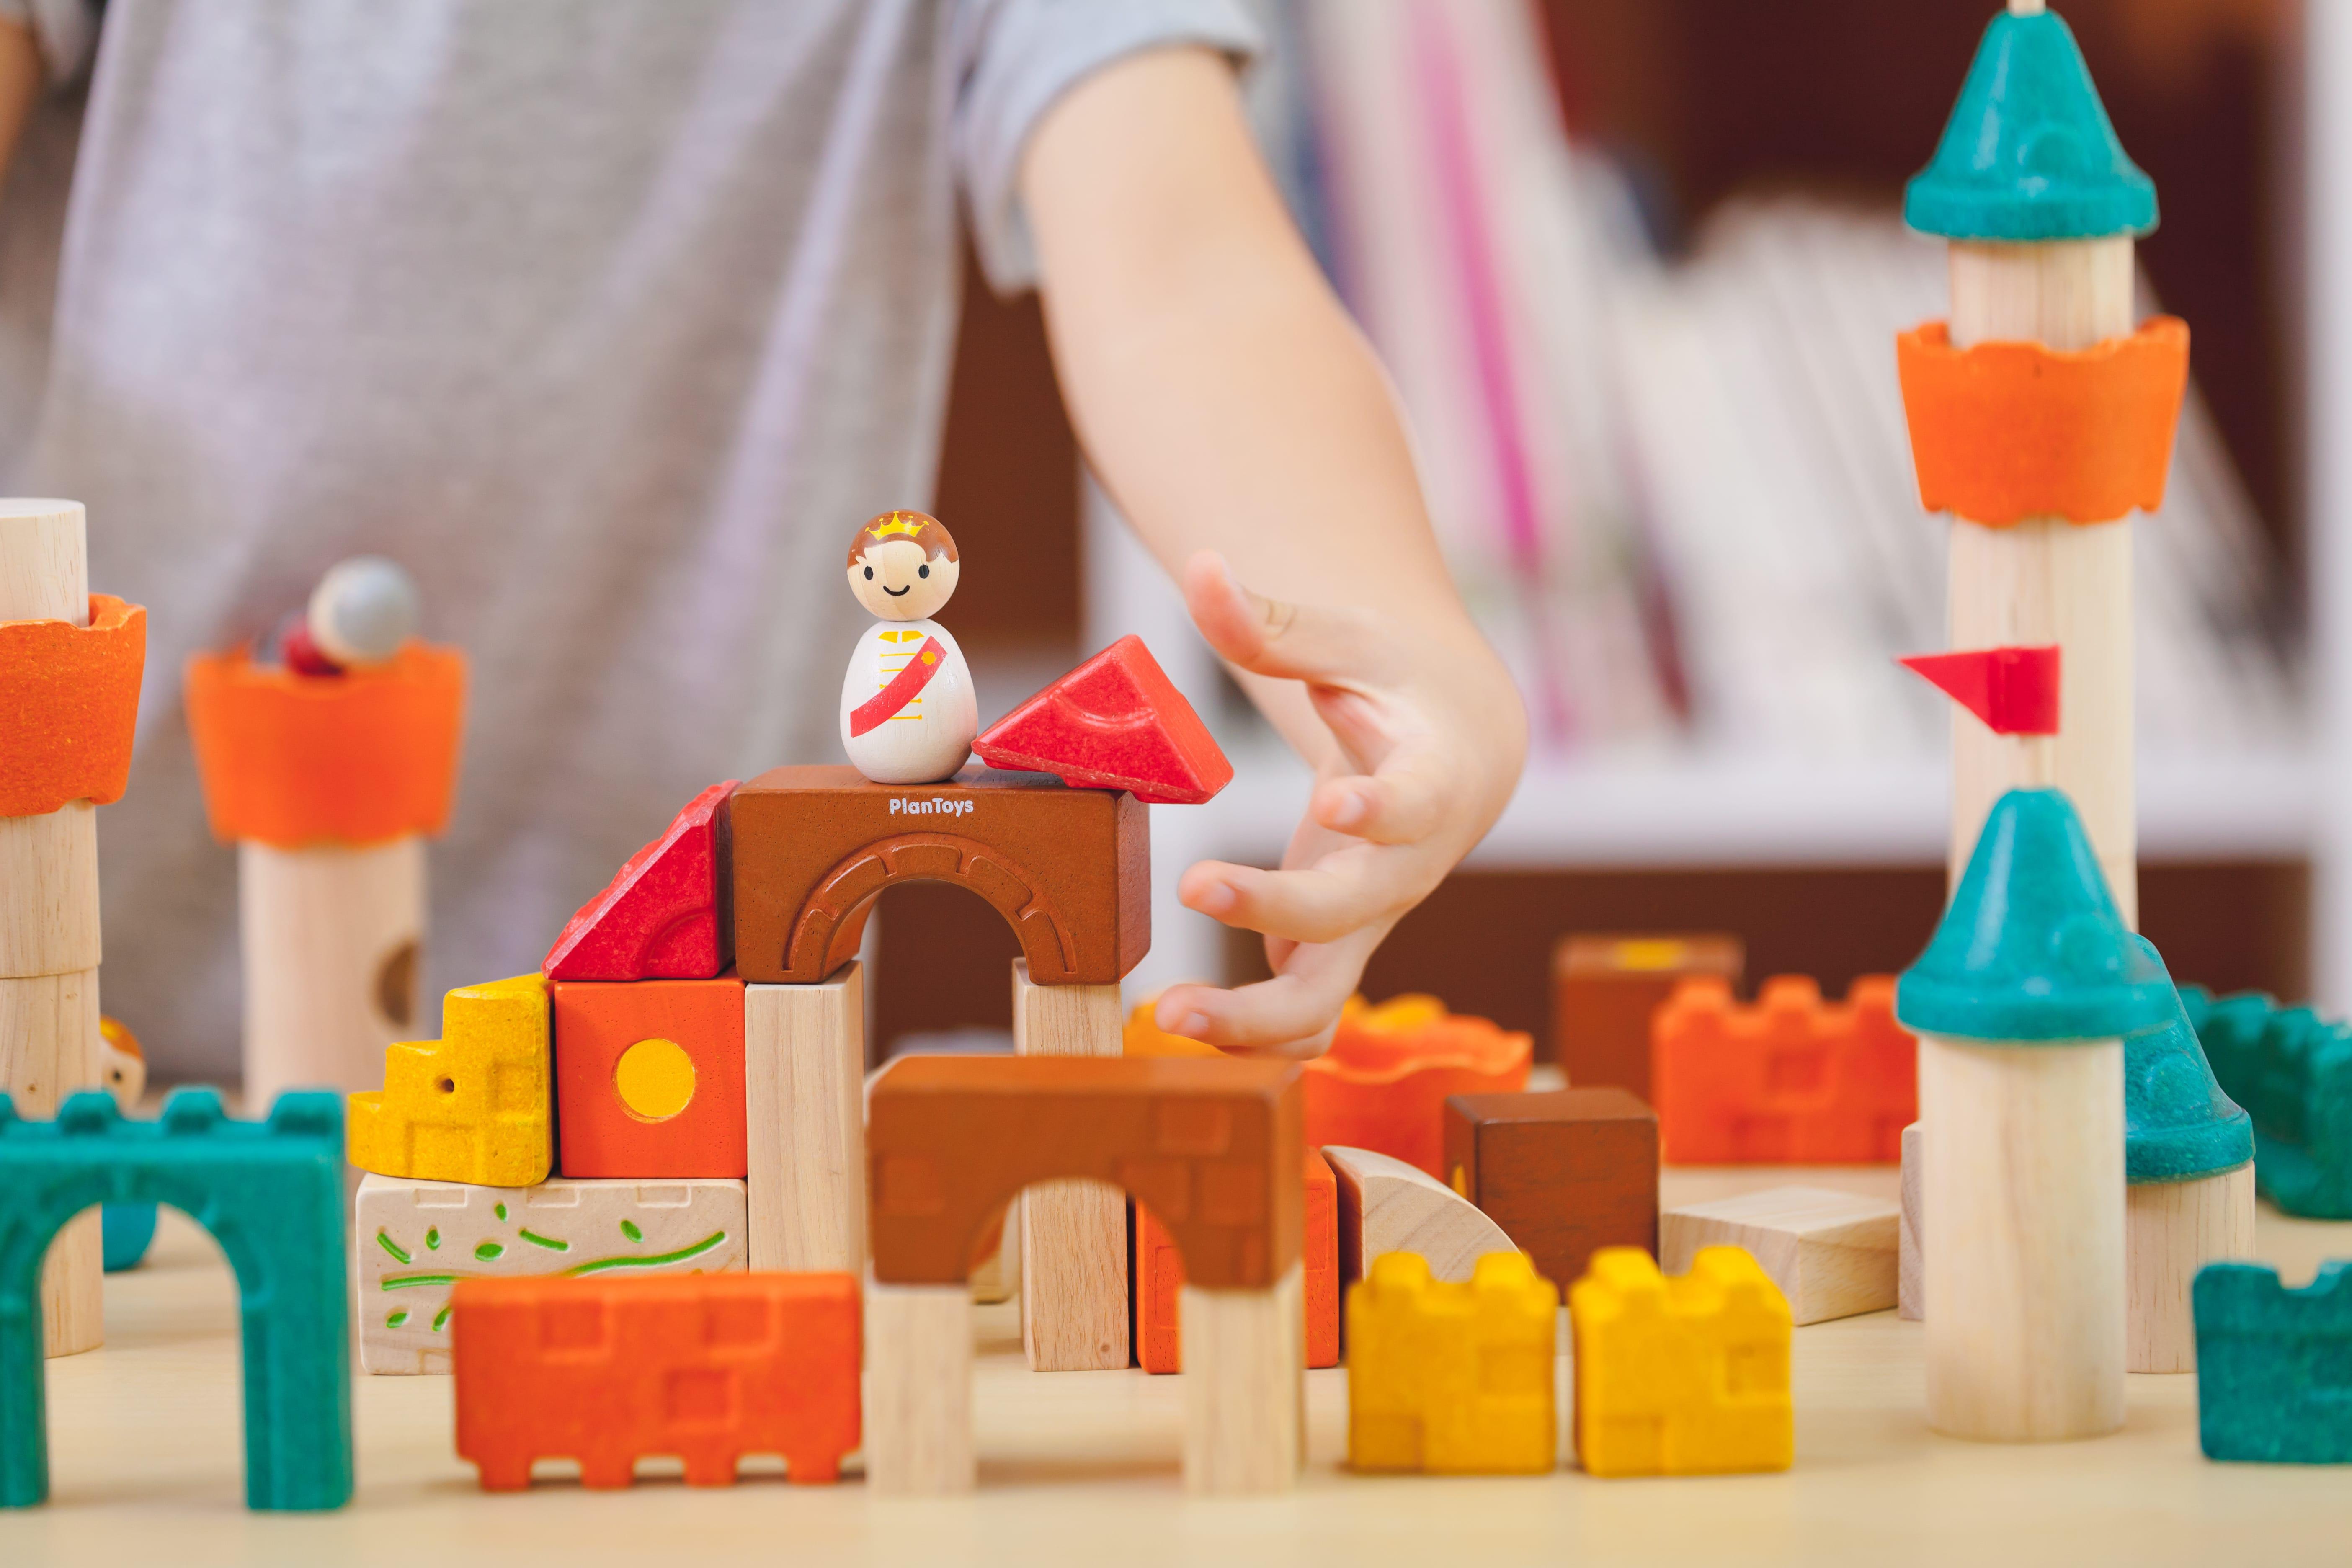 5696_PlanToys_FANTASY_BLOCKS_Blocks_and_Construction_Fine_Motor_Coordination_Creative_Tactile_3yrs_Wooden_toys_Education_toys_Safety_Toys_Non-toxic_0.jpg